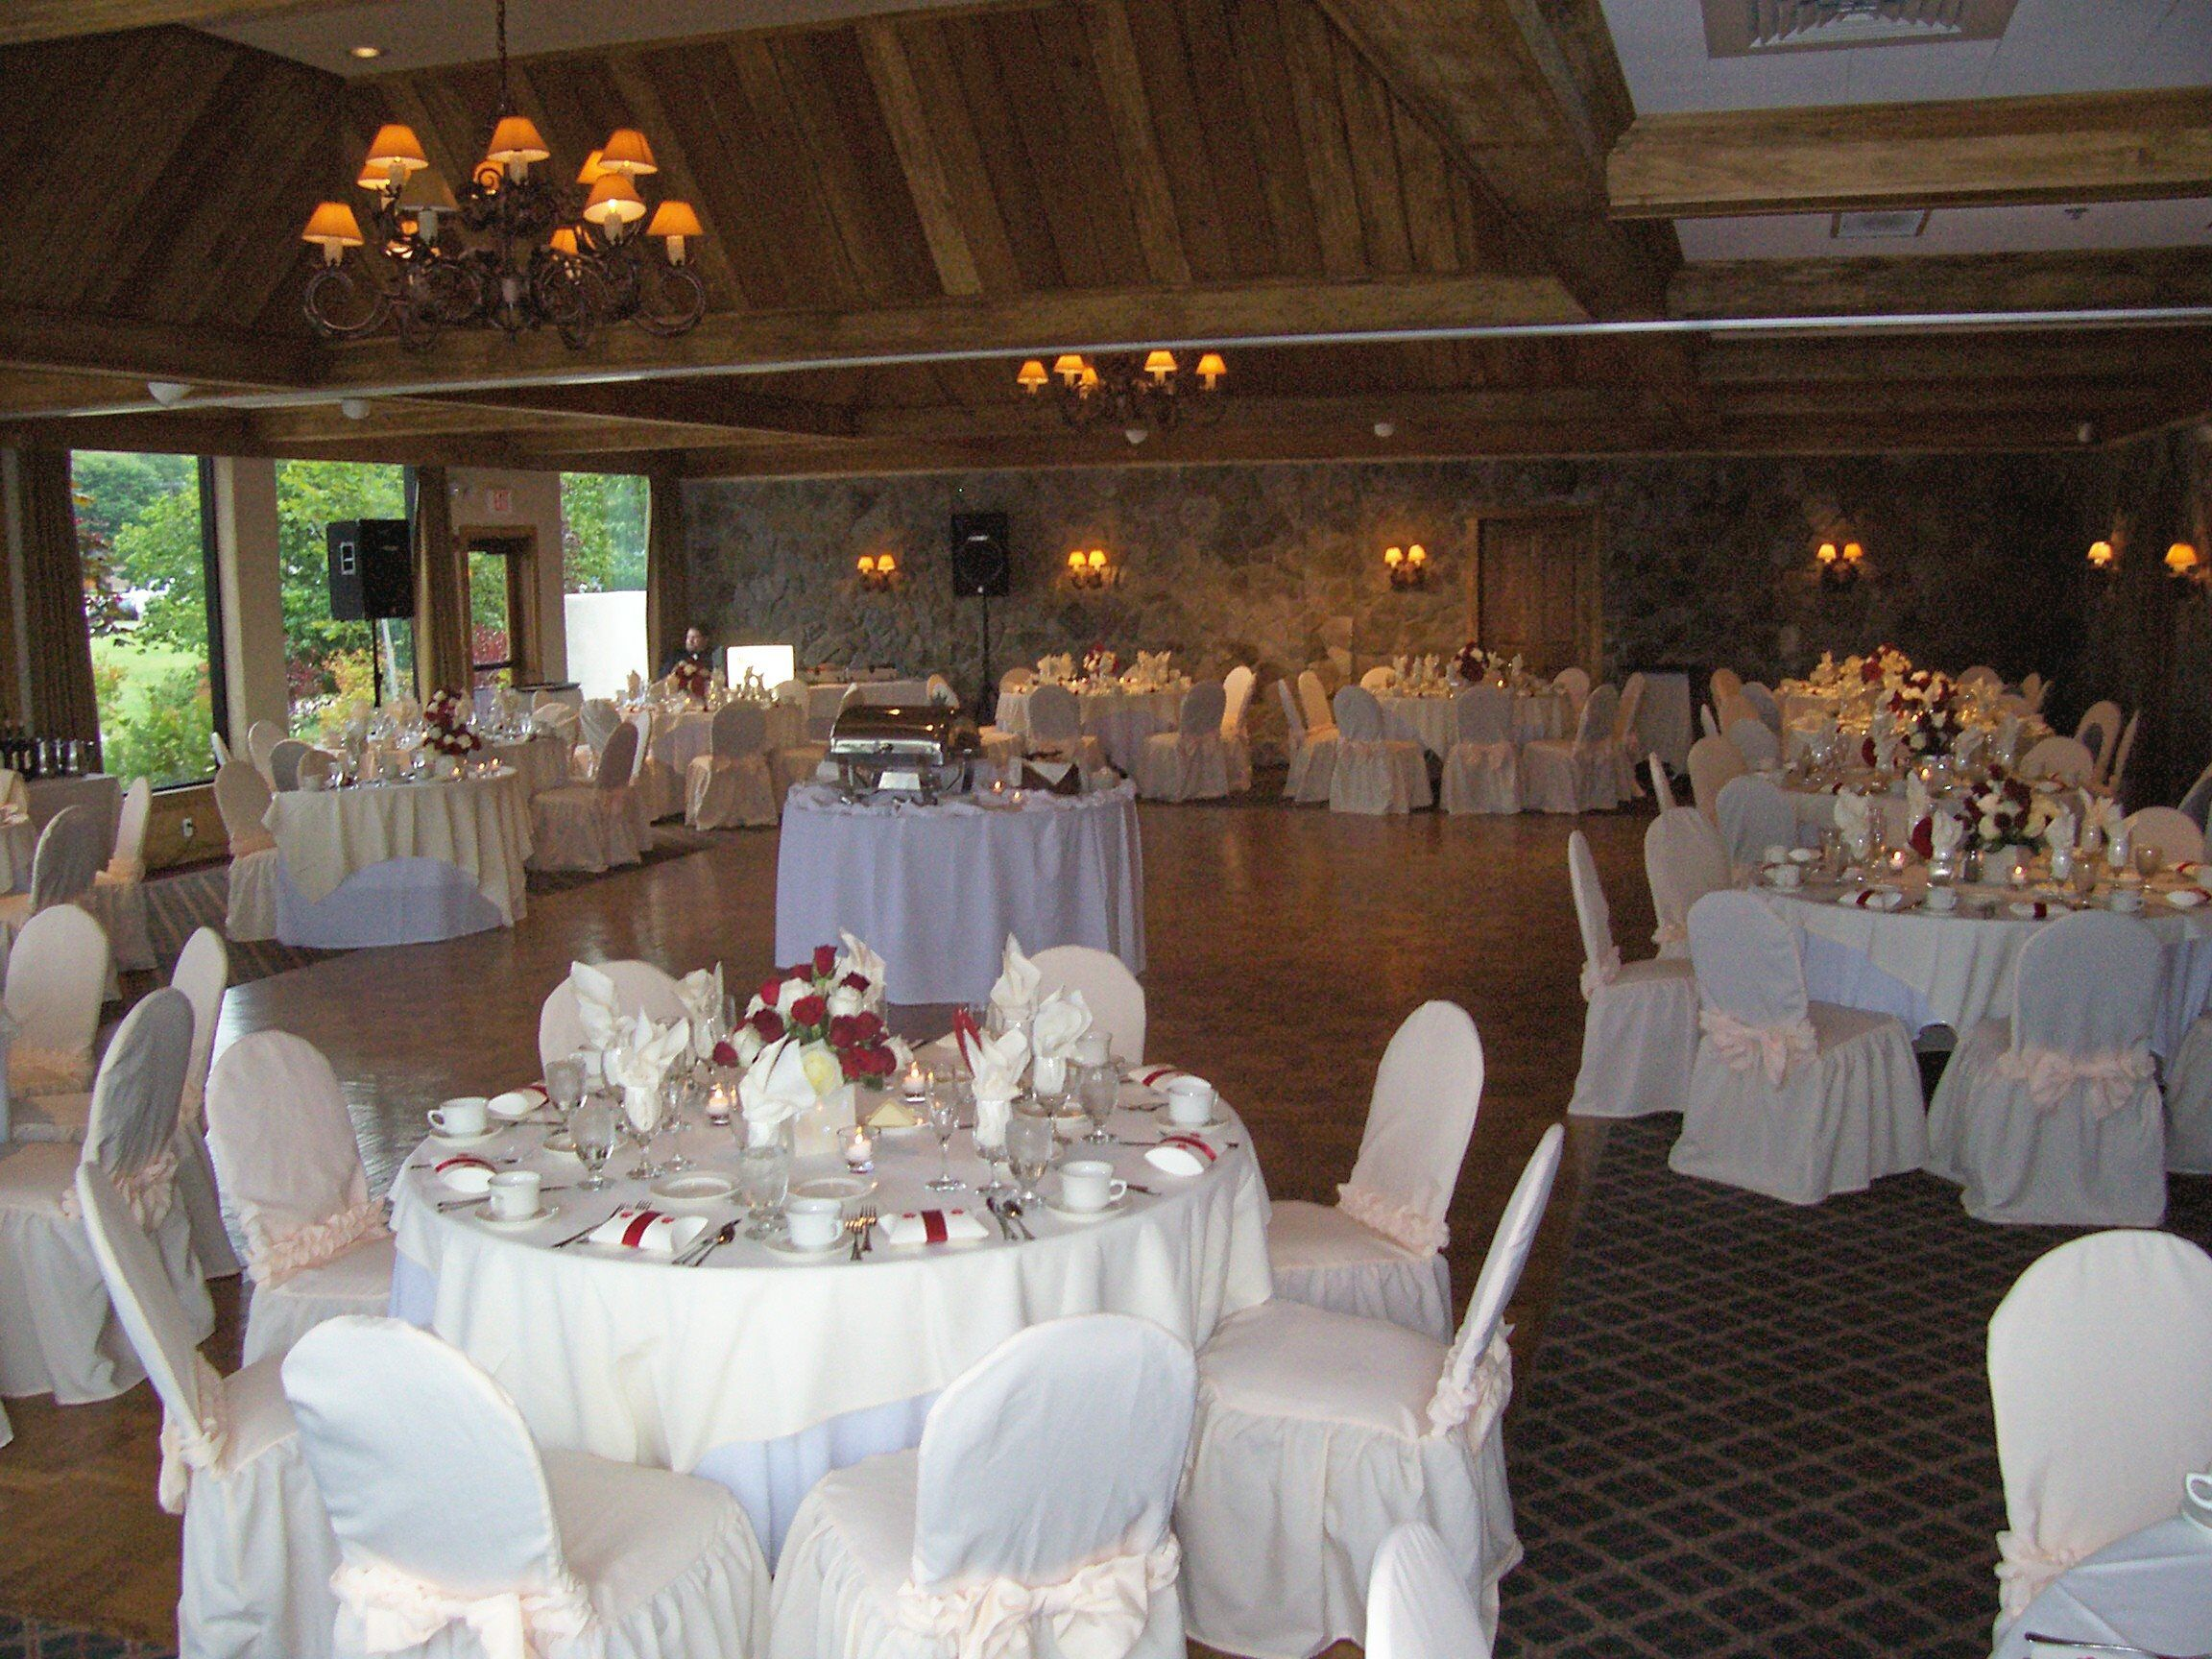 Our banquet rooms templeton landing templeton landing wedding venues junglespirit Gallery